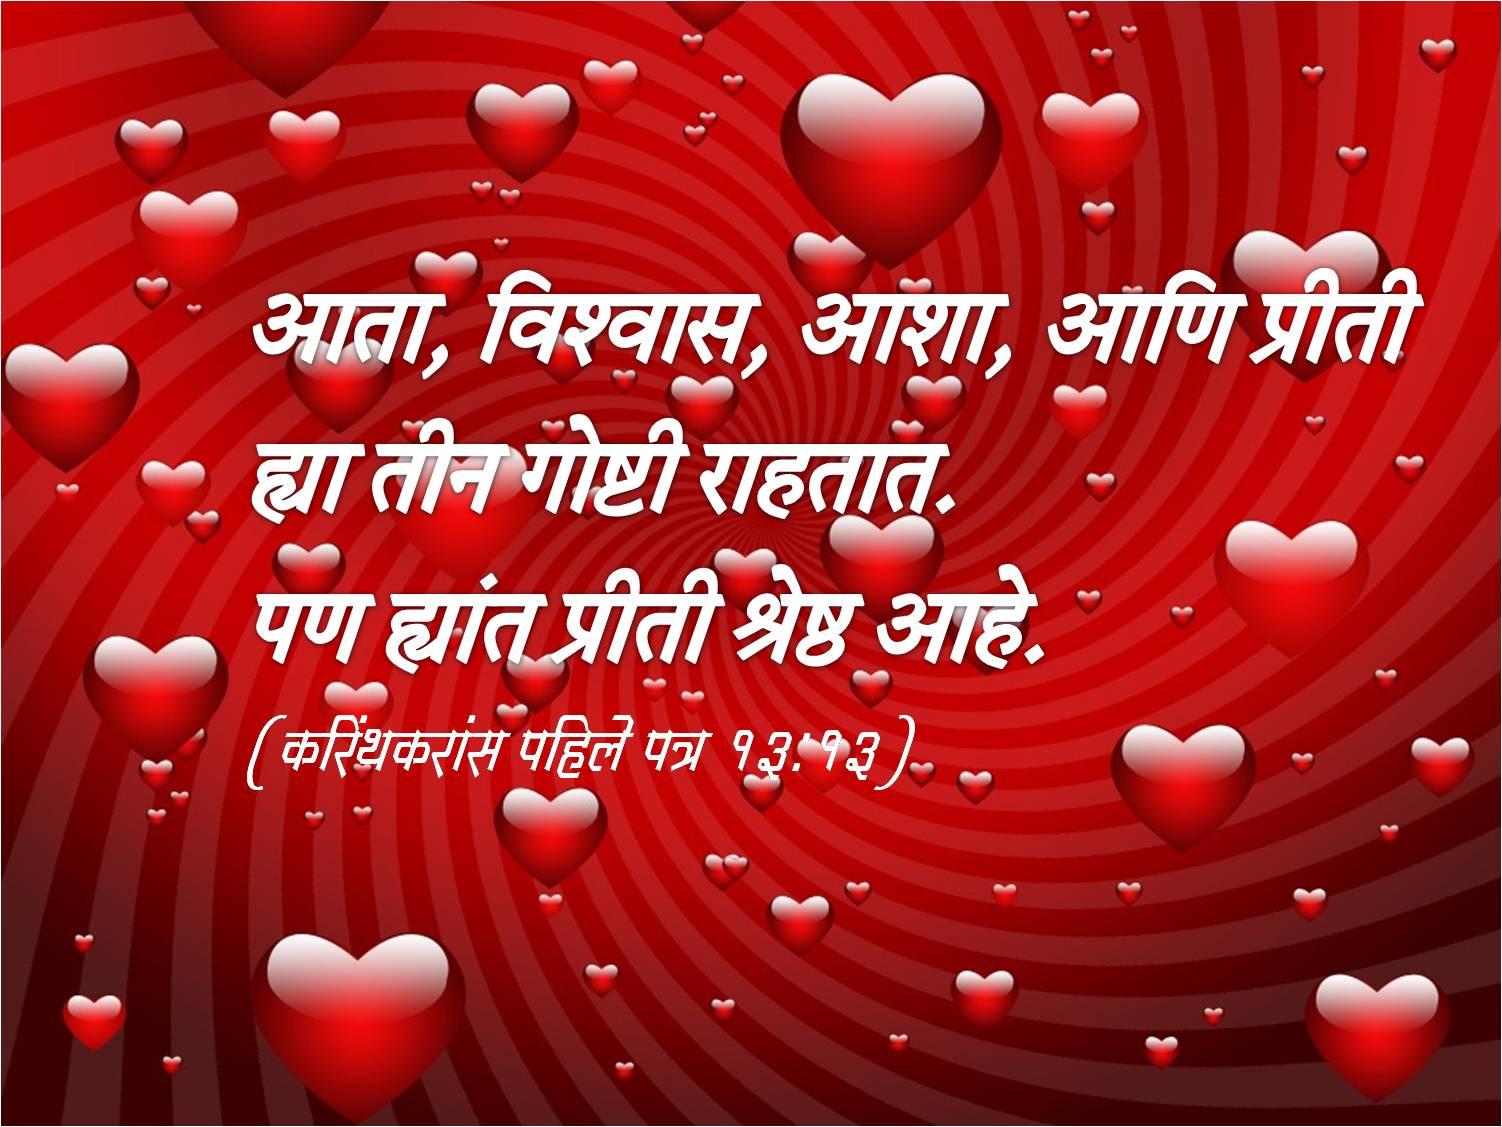 February Valentine's Day